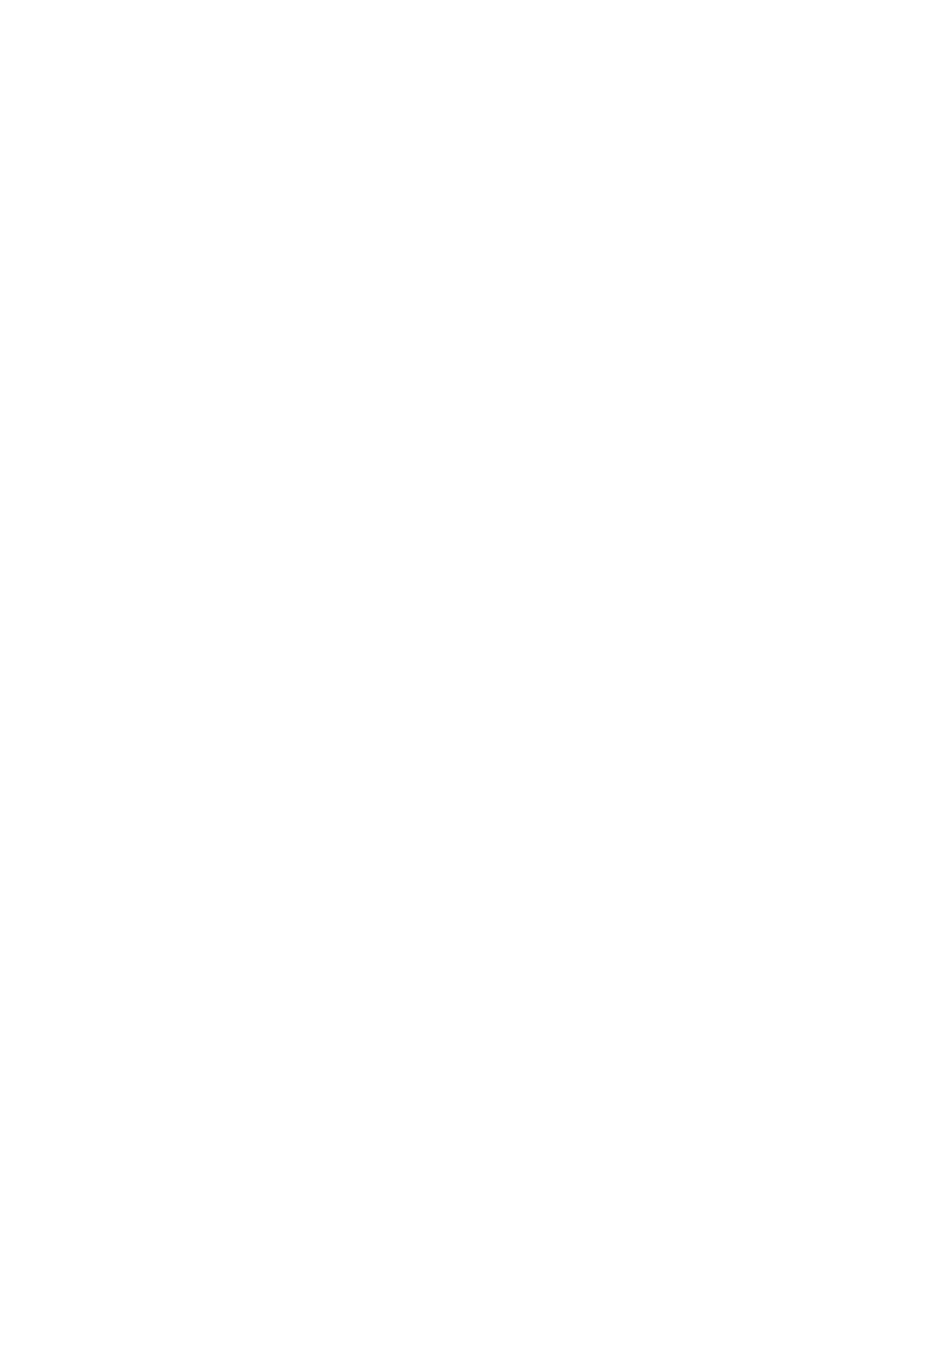 visit England gold award icon